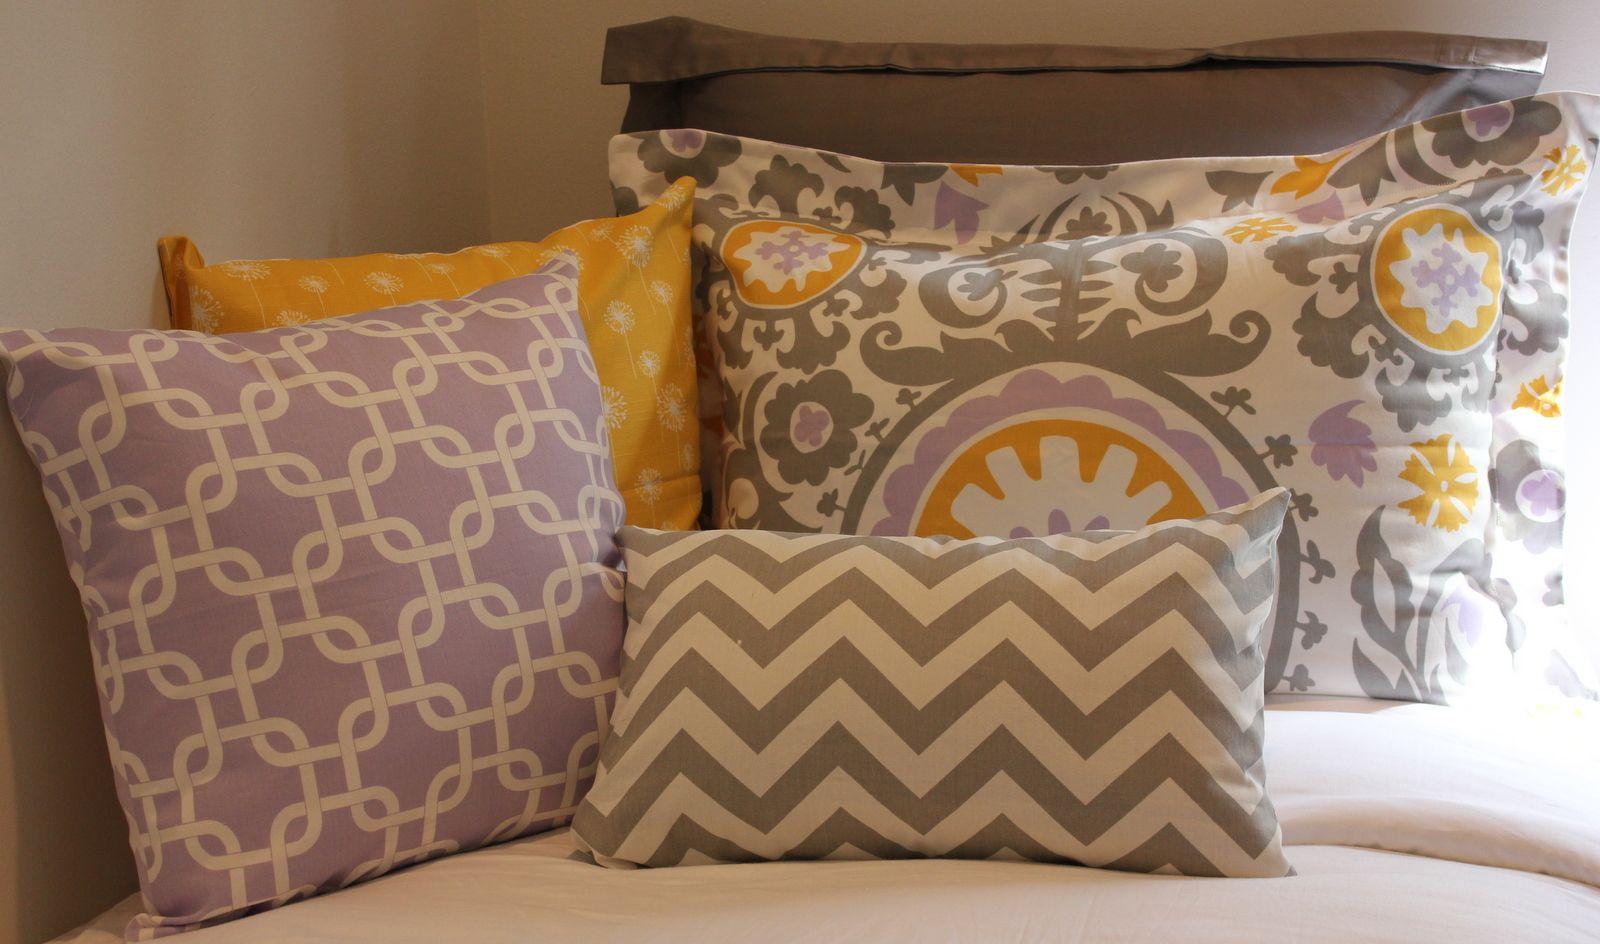 Dorm Room Bedding Makes Perfect Graduation Gift | Sorority and Dorm Room Bedding